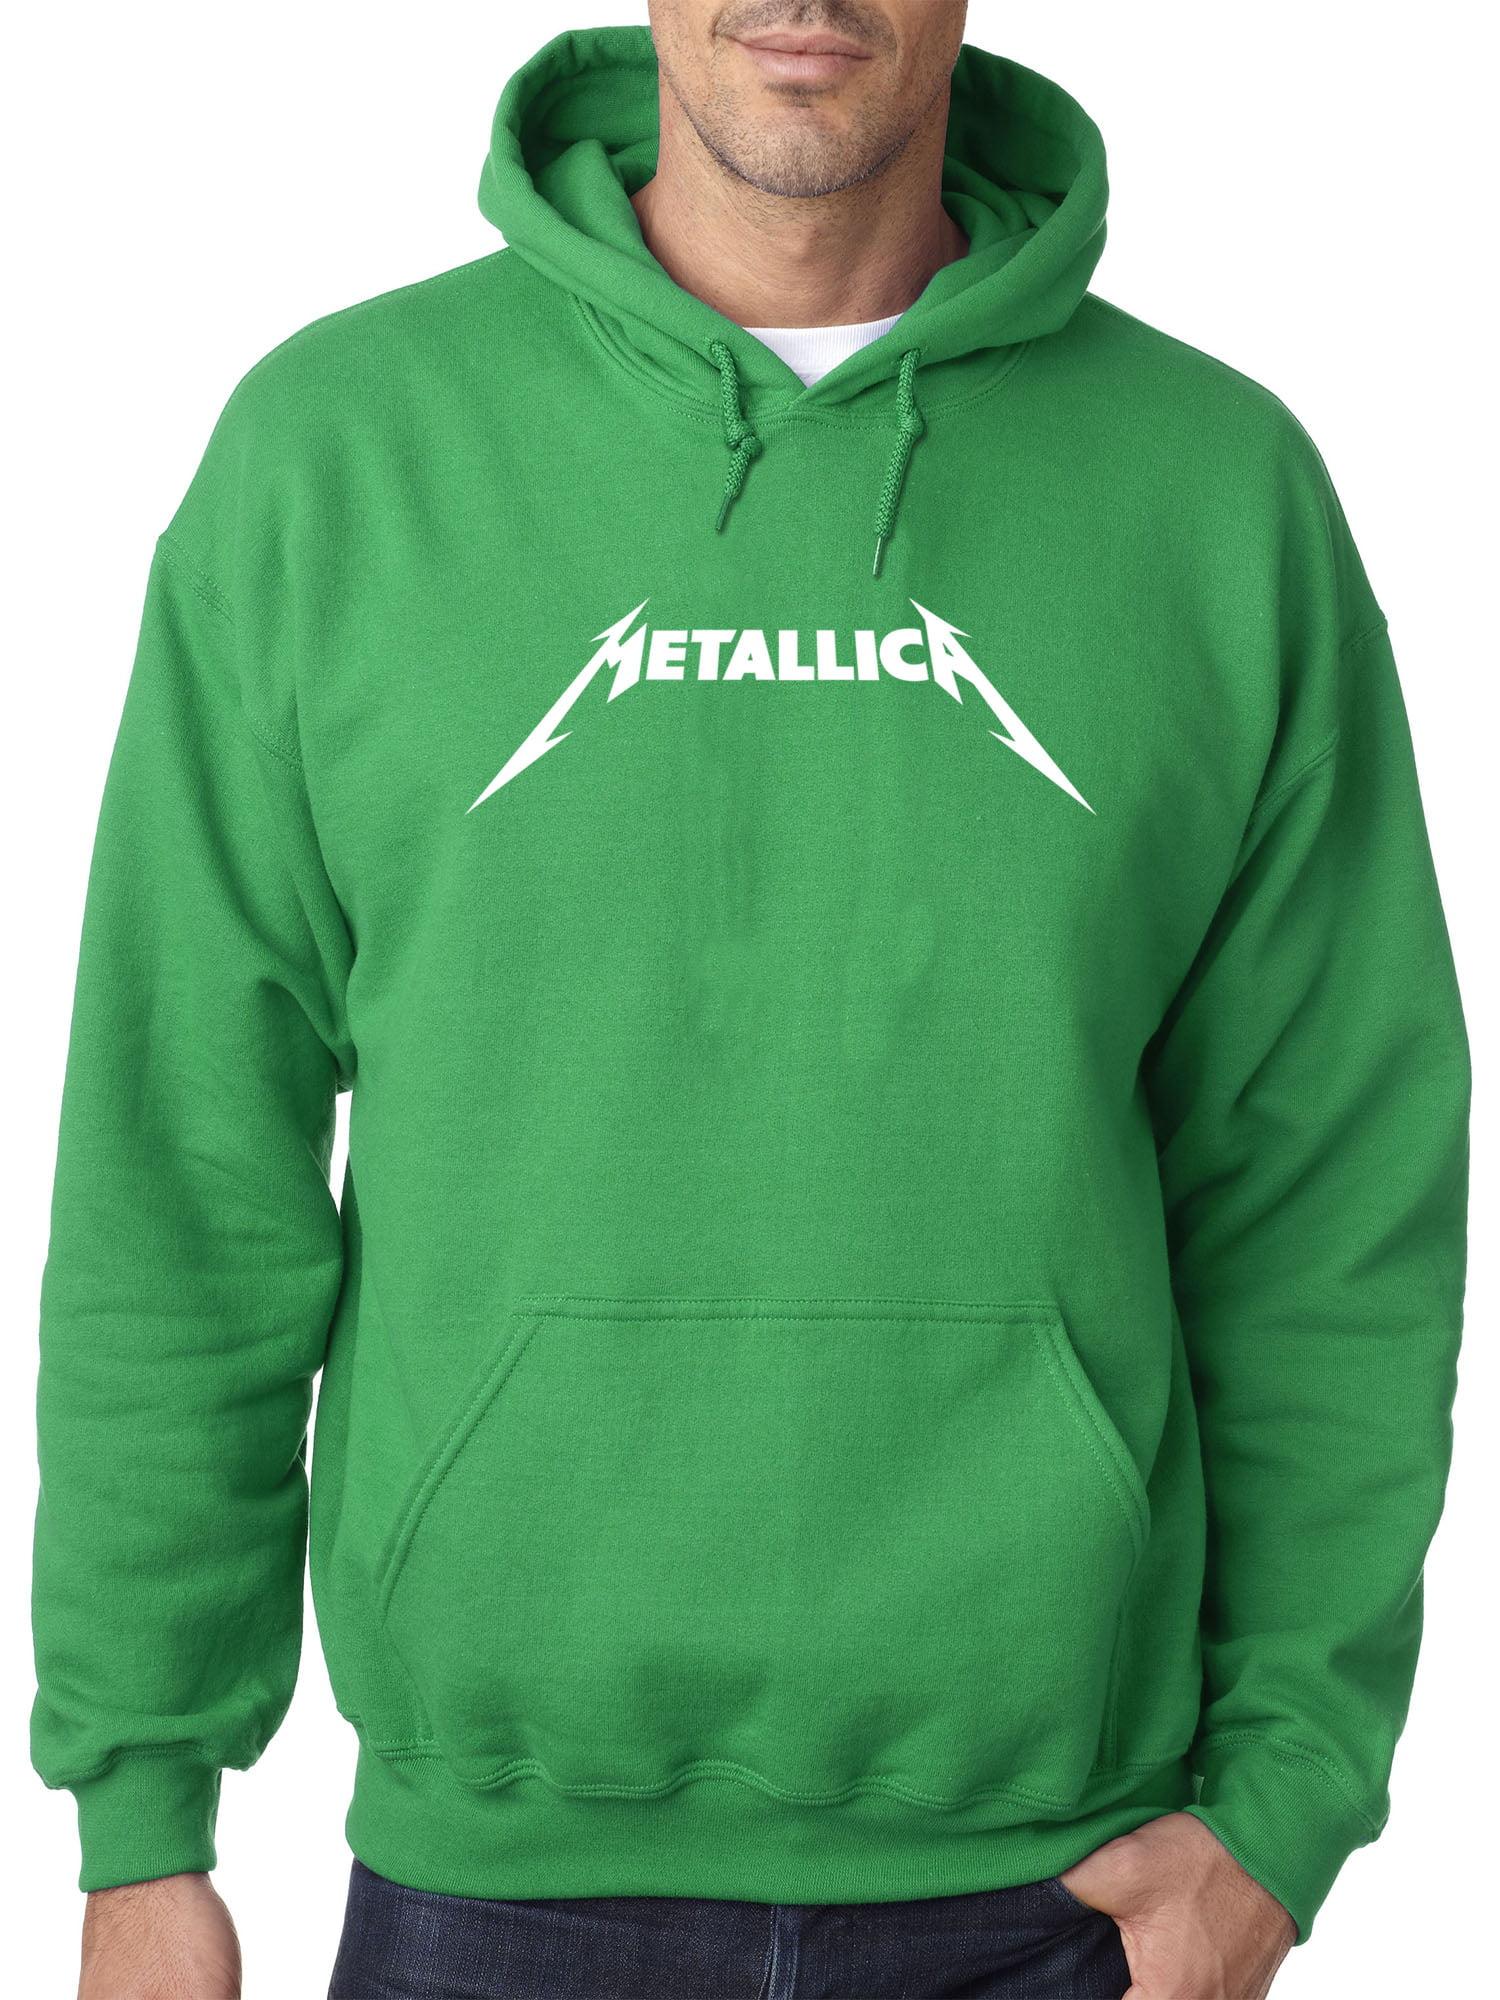 Metallica Metal Rock Band Logo Unisex Hoodie Adult Sizes S-XL Black